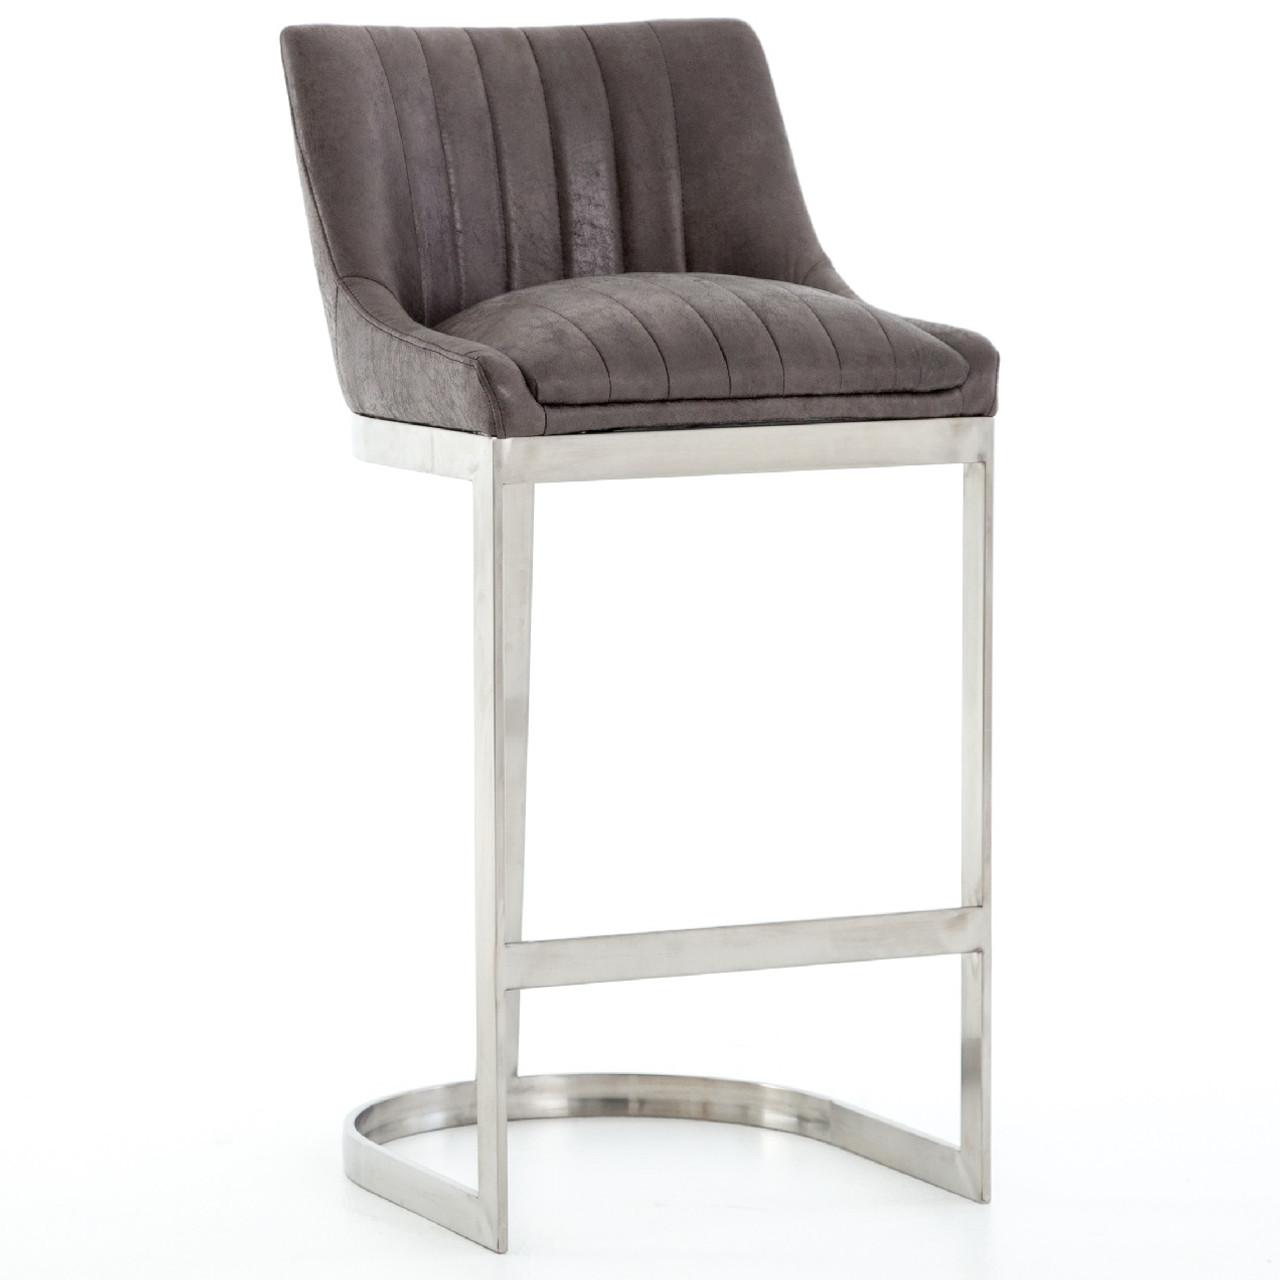 Superb Rory Graphite Leather Stainless Steel Bar Stool Creativecarmelina Interior Chair Design Creativecarmelinacom